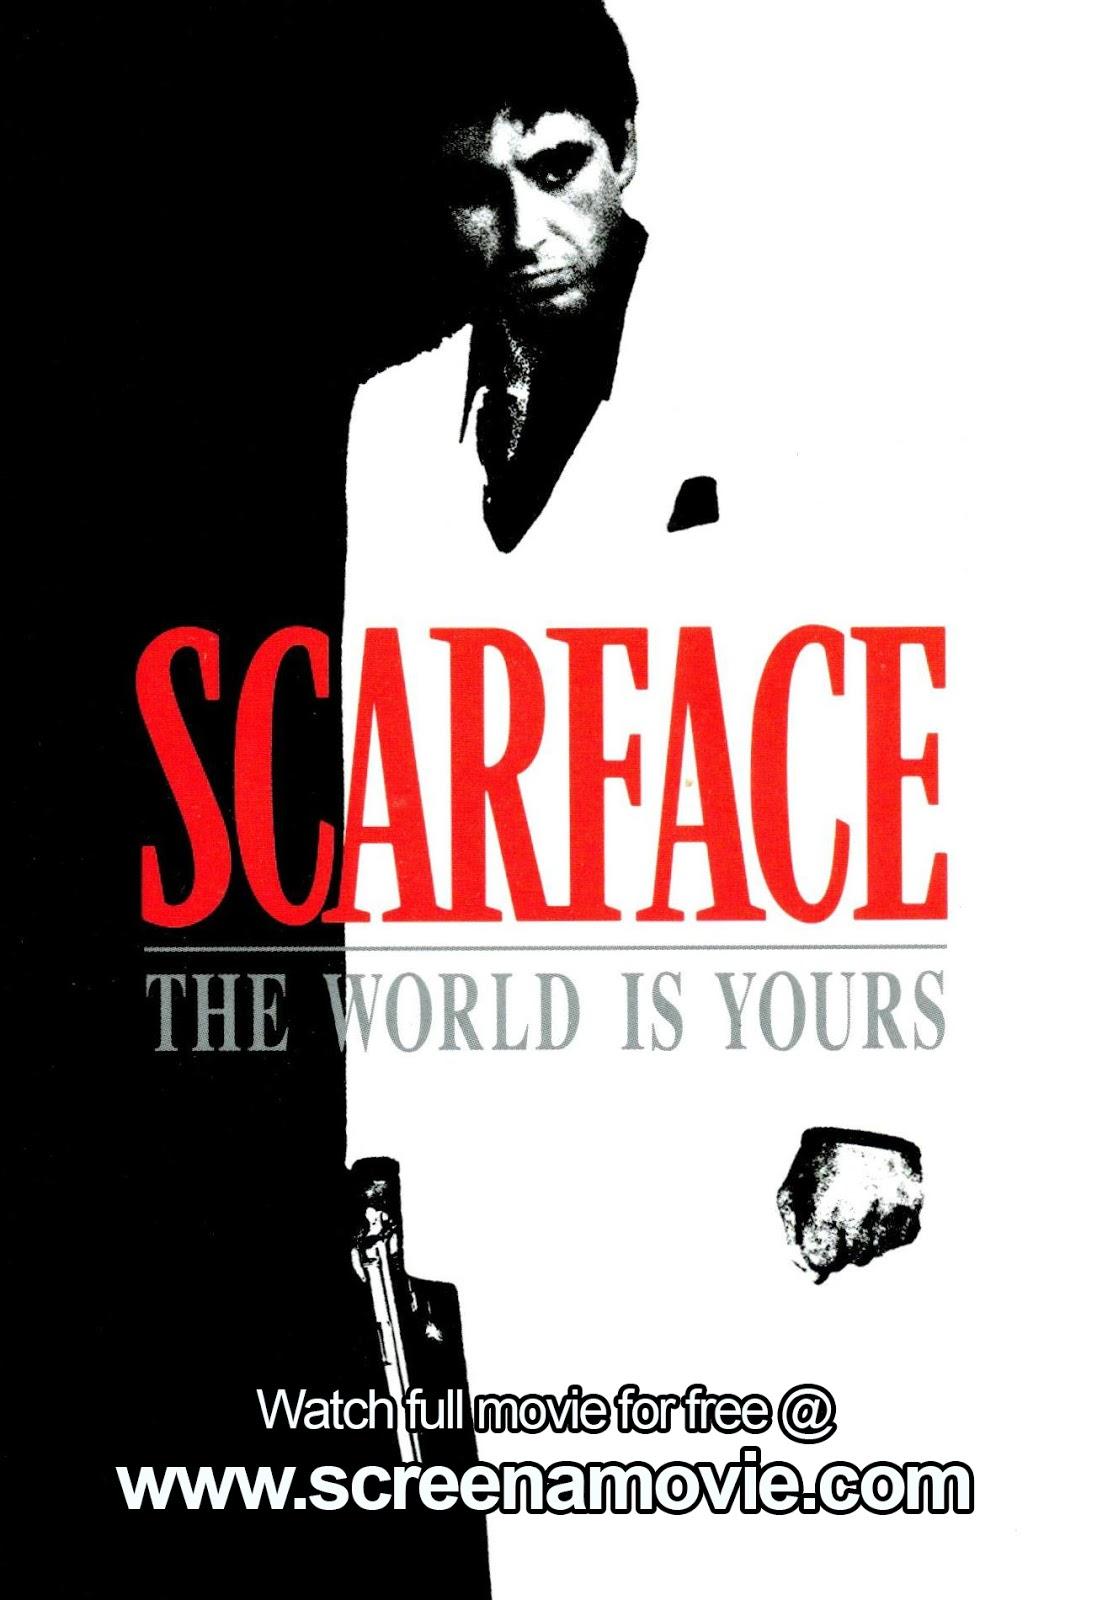 Scarface Full Length Movie | gnewsinfo.com